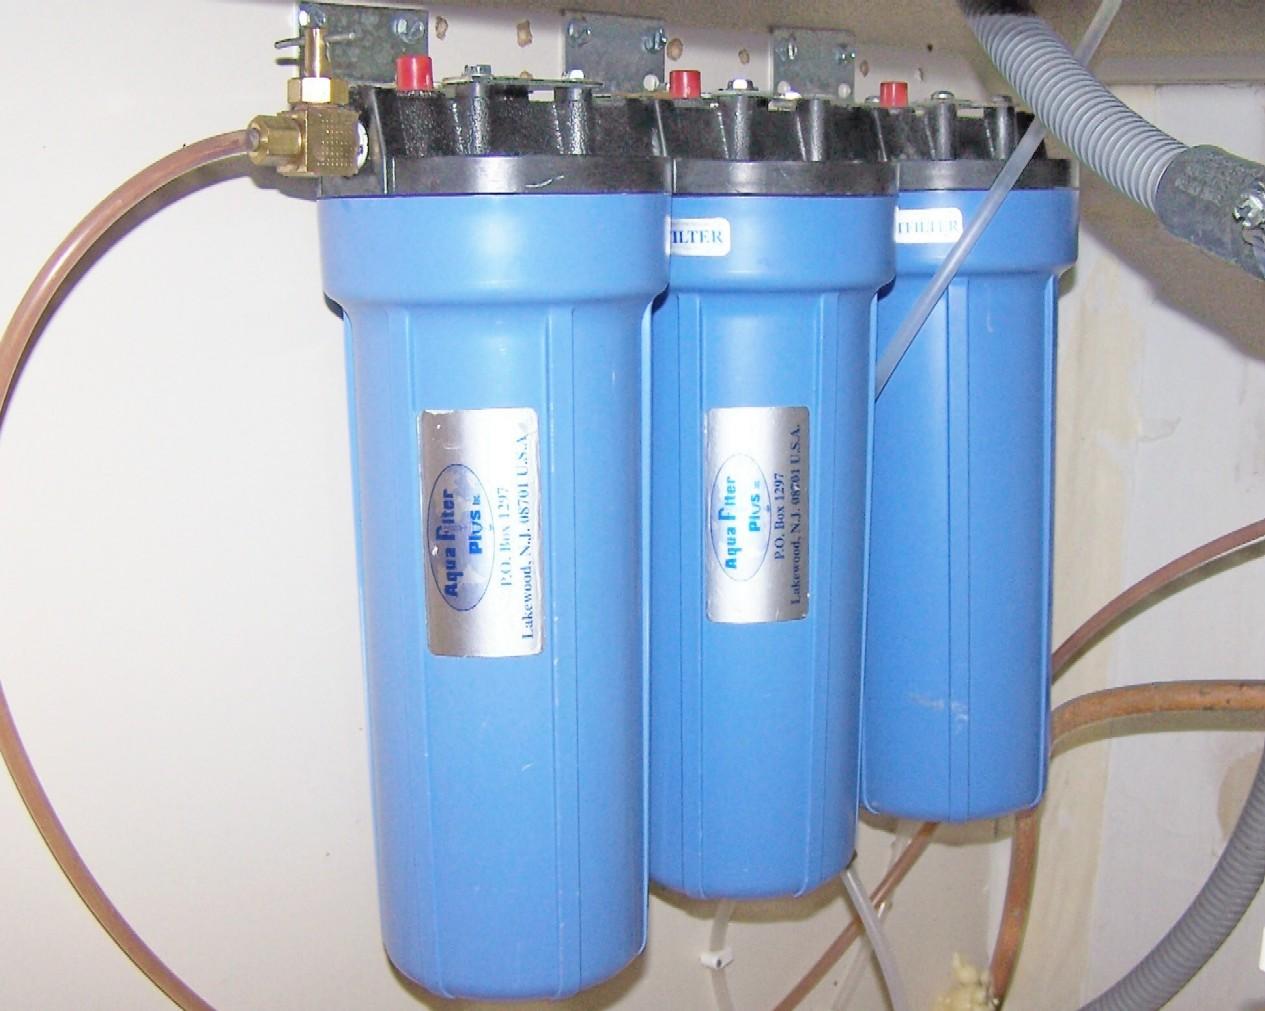 Aqua Filter Plus AFP310FC Triple-Tank Filtration System UPGRADED MODEL